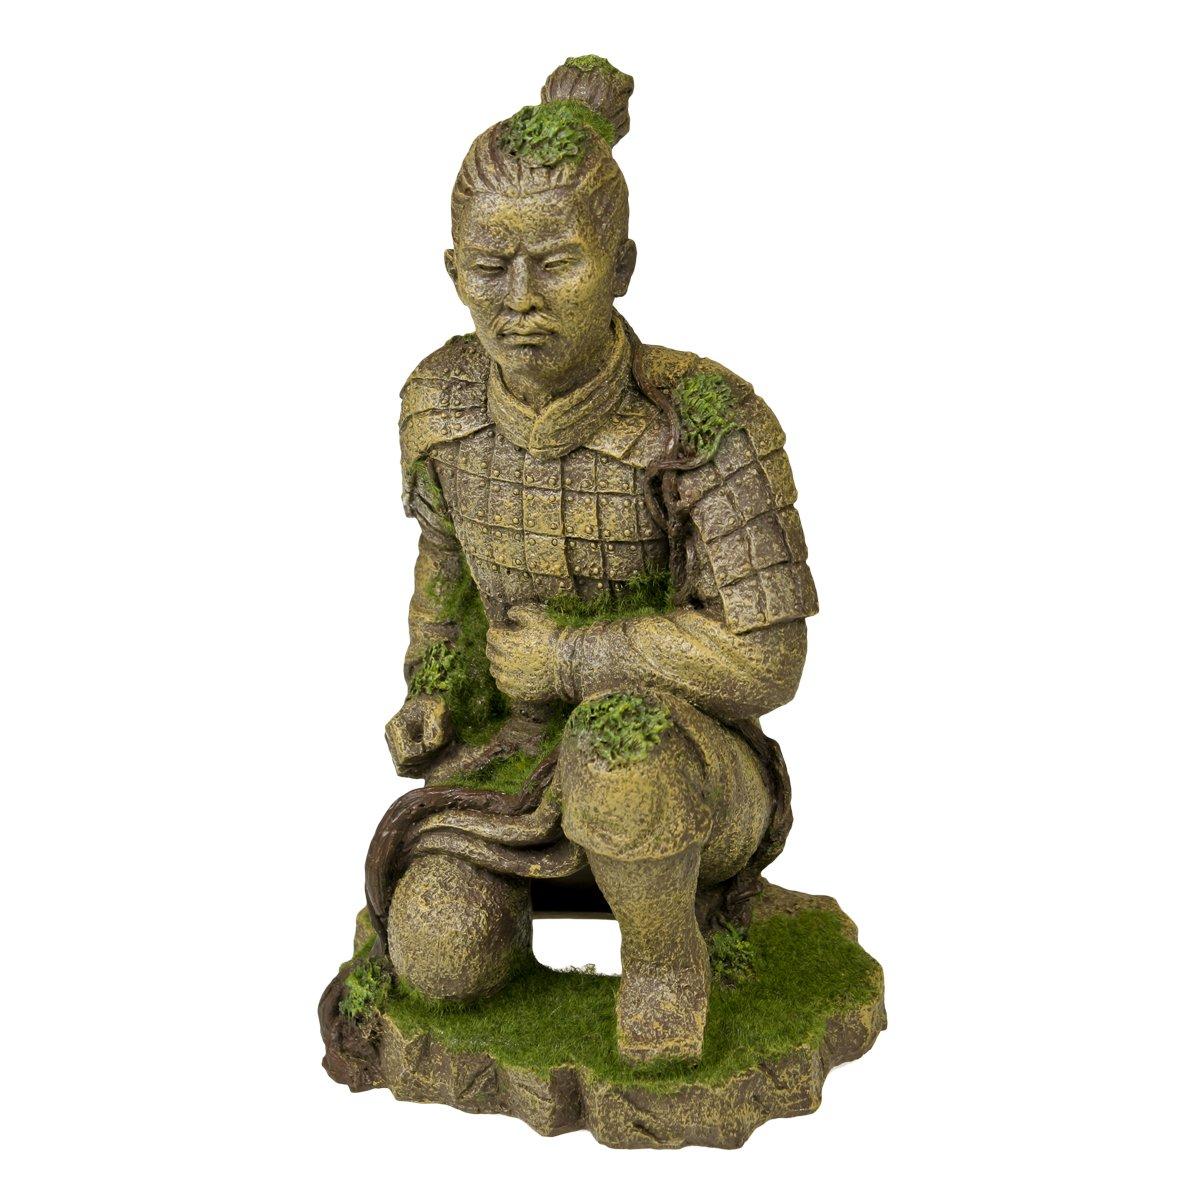 blu Ribbon 006161 Exotic ambienti Qing Dynasty statua in terracotta